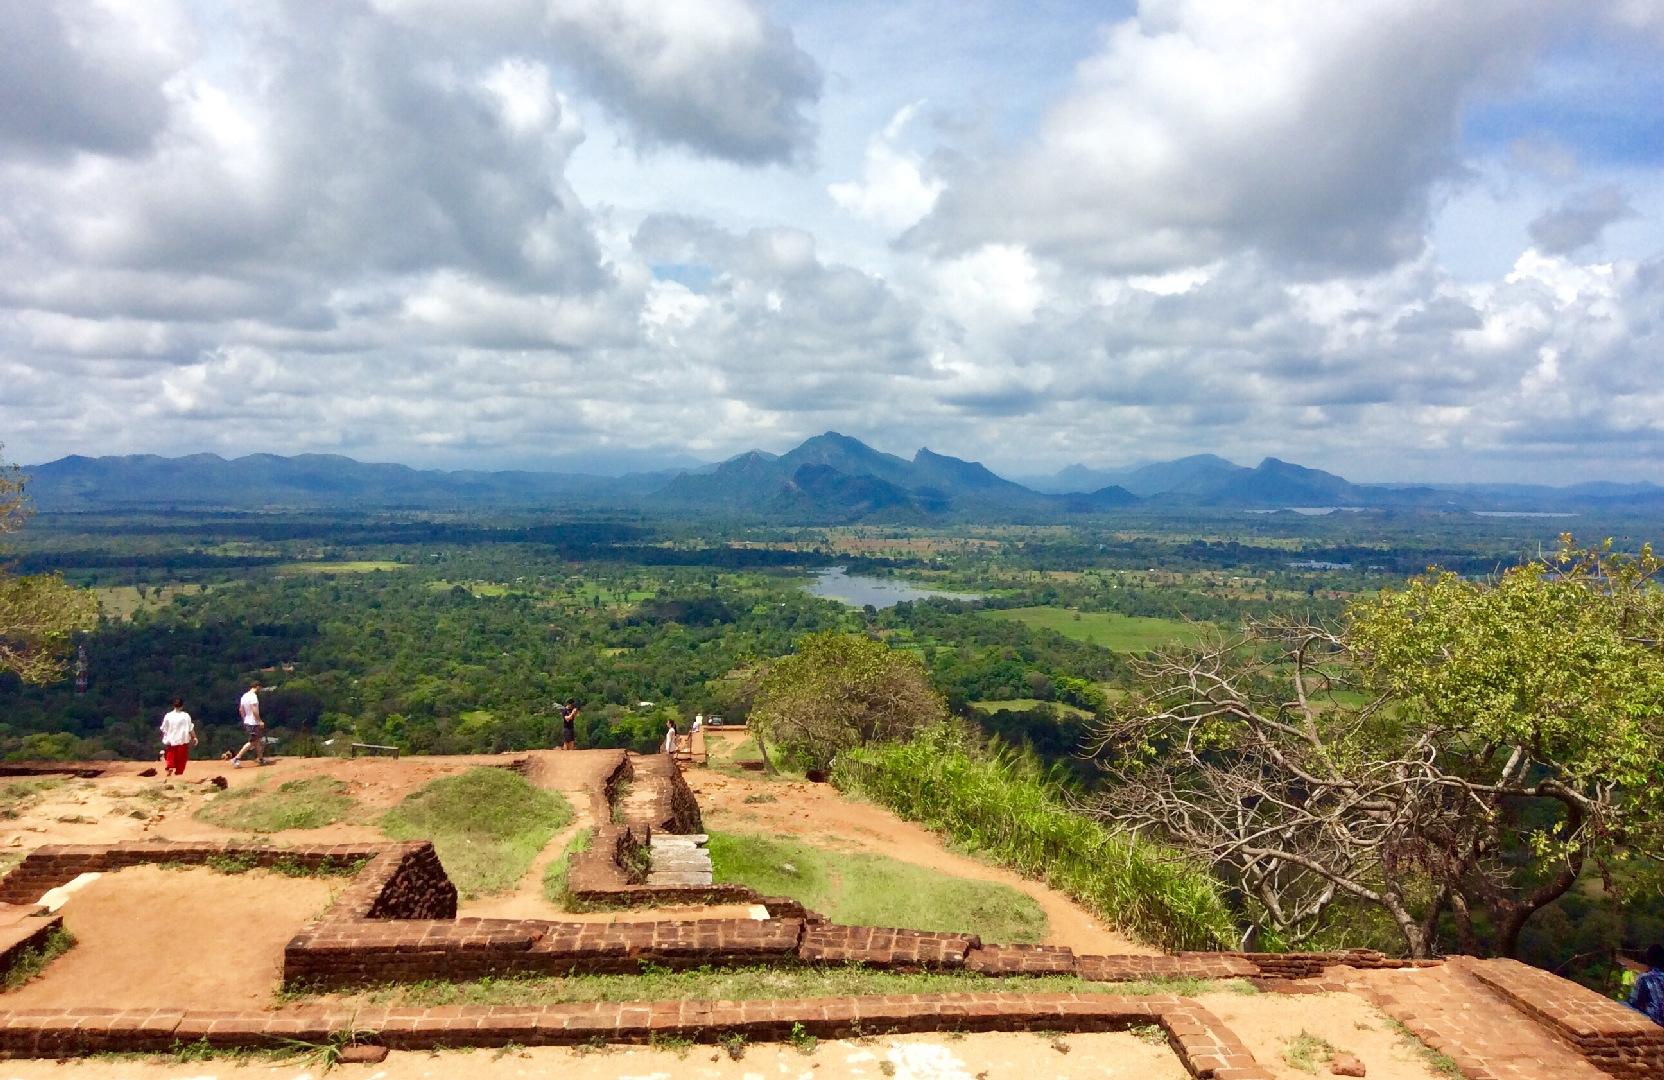 Sri Lanka: Dambulla Kandy Sigiriyę